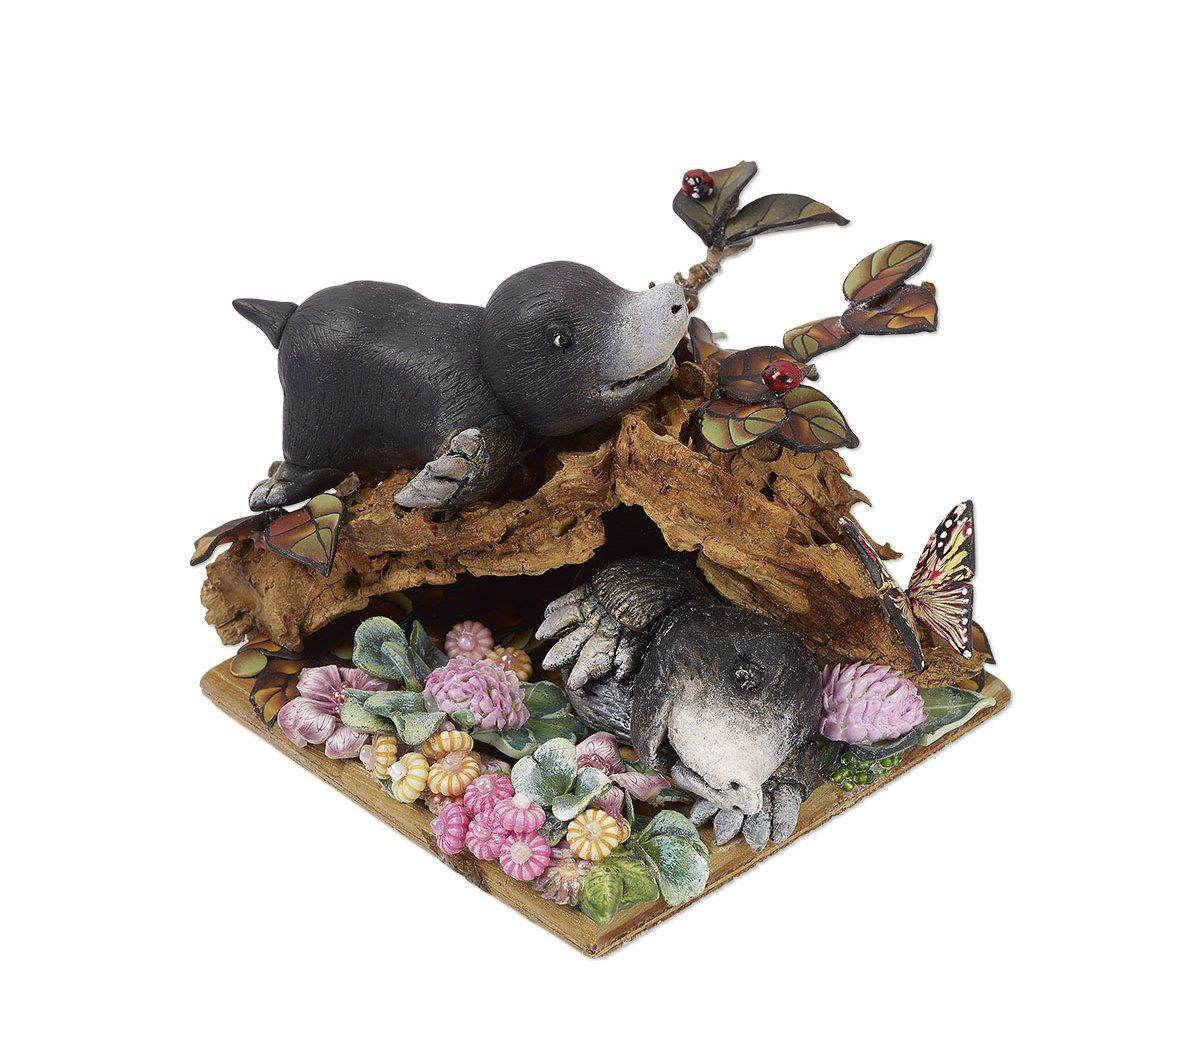 "Polymer Clay Sculptures - Design Idea G93U ""Moles at Play"" Grand Prize President's Award Winner Designer Cornelia Maria Radu Antonescu. Fire Mountain Gems and Beads' Contest 2016 featuring Creative Clays - Finalist #jewelrymakingcontest #polymerclay #jewelrydesign"